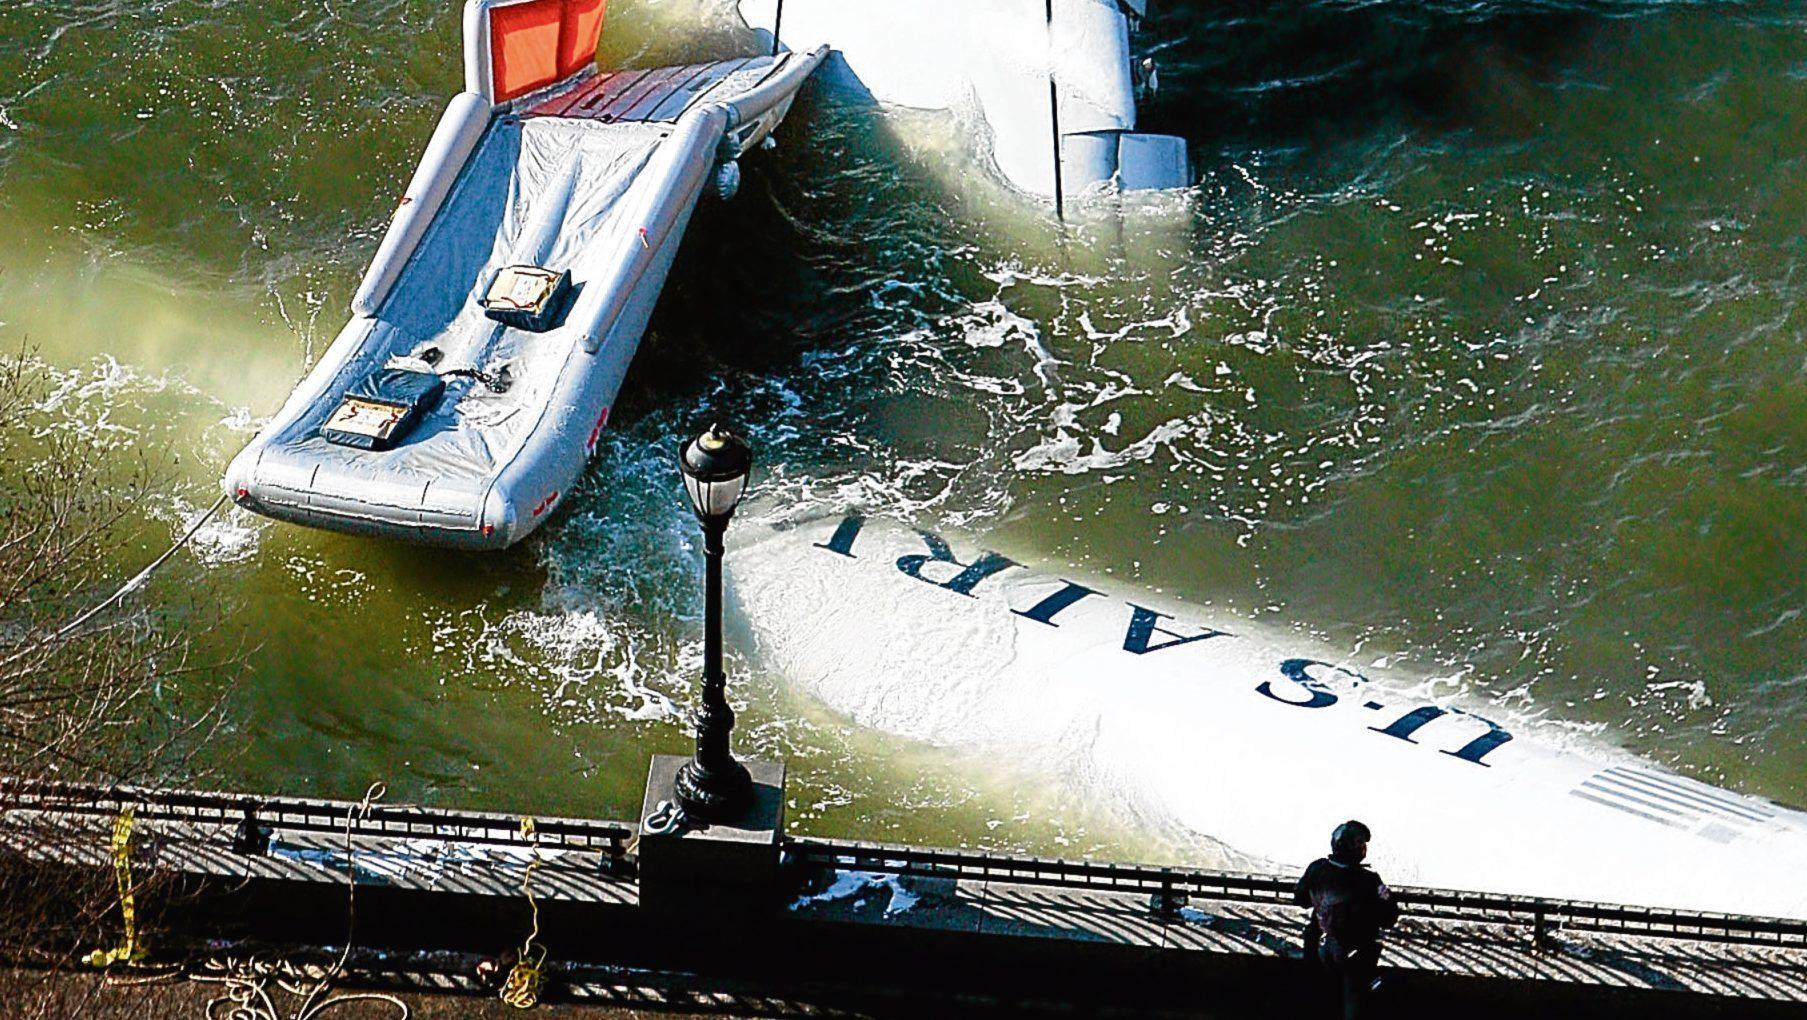 The US Airways passenger jet crashed into New York's Hudson River